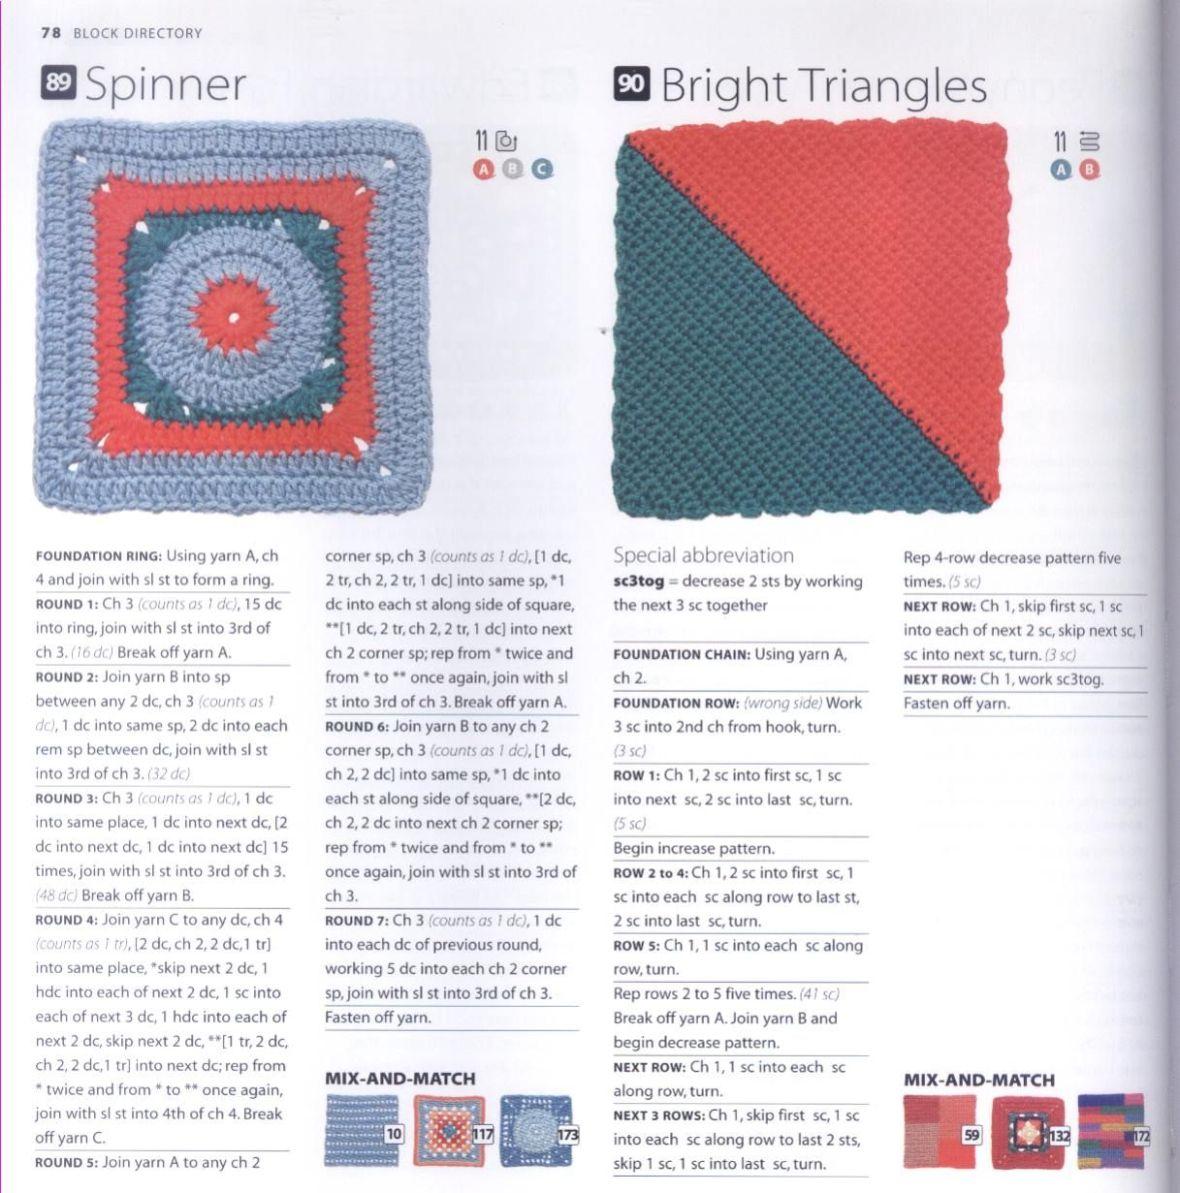 200 Crocheted Blocks for blankets, throws & Afghans 078